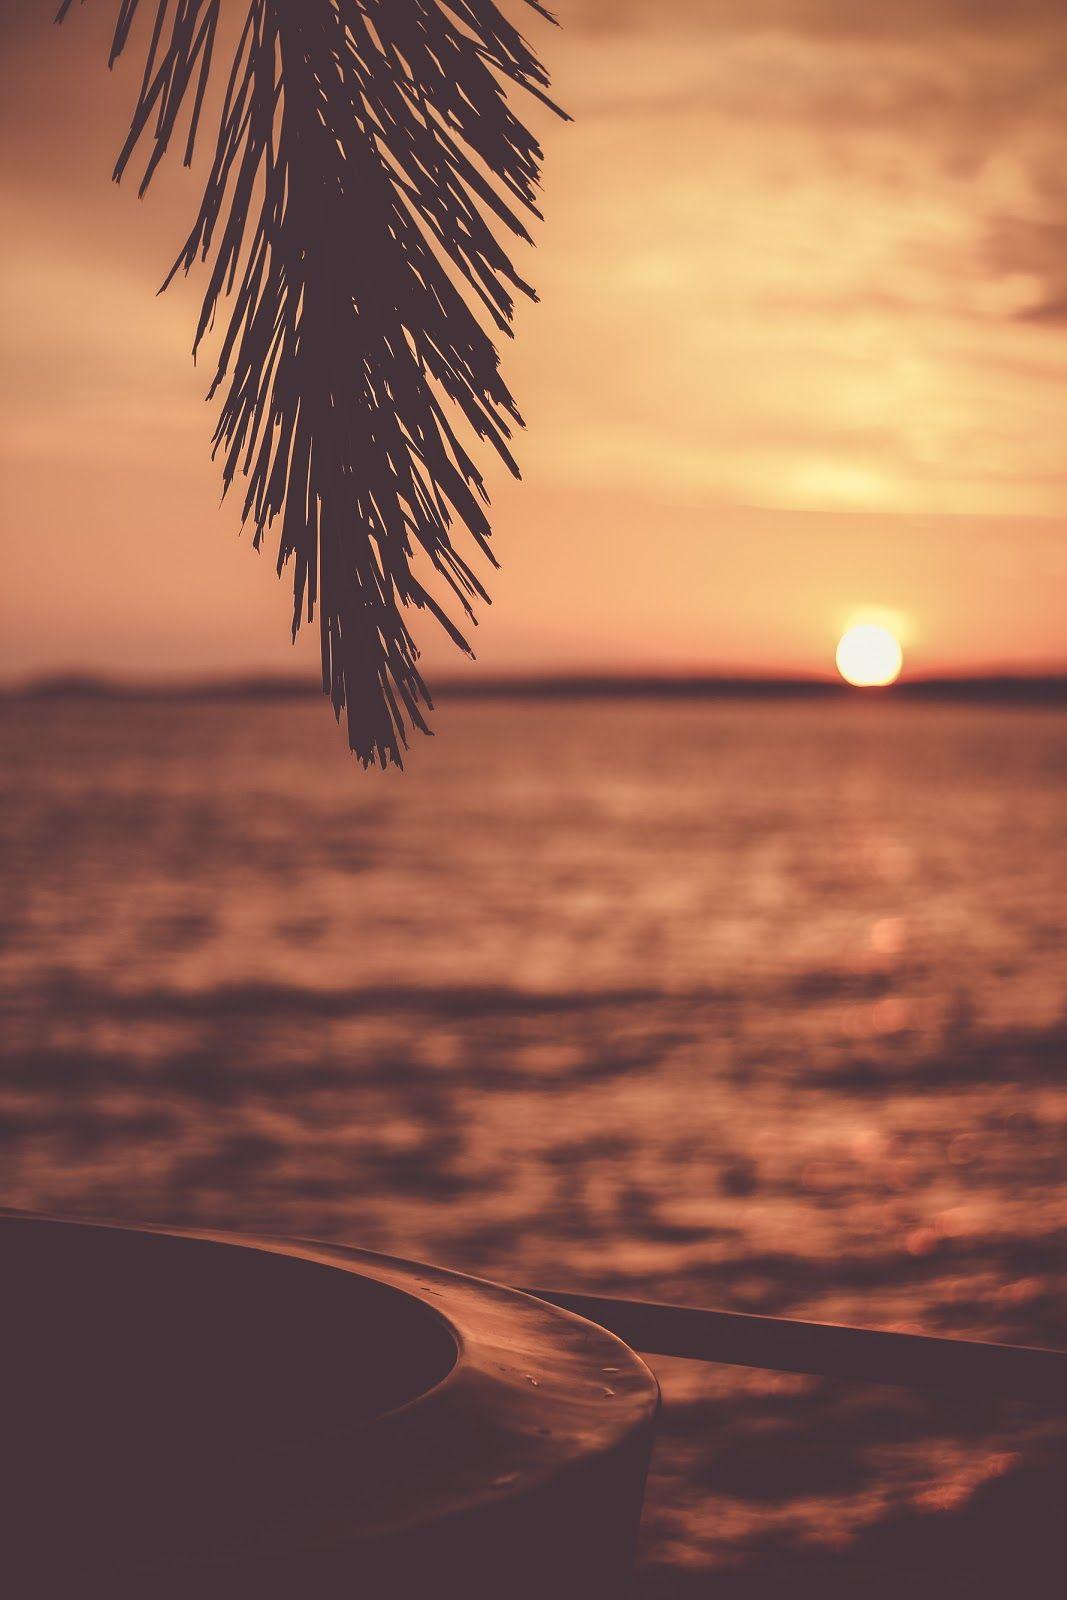 Golden Sunset, Tropical, Travel